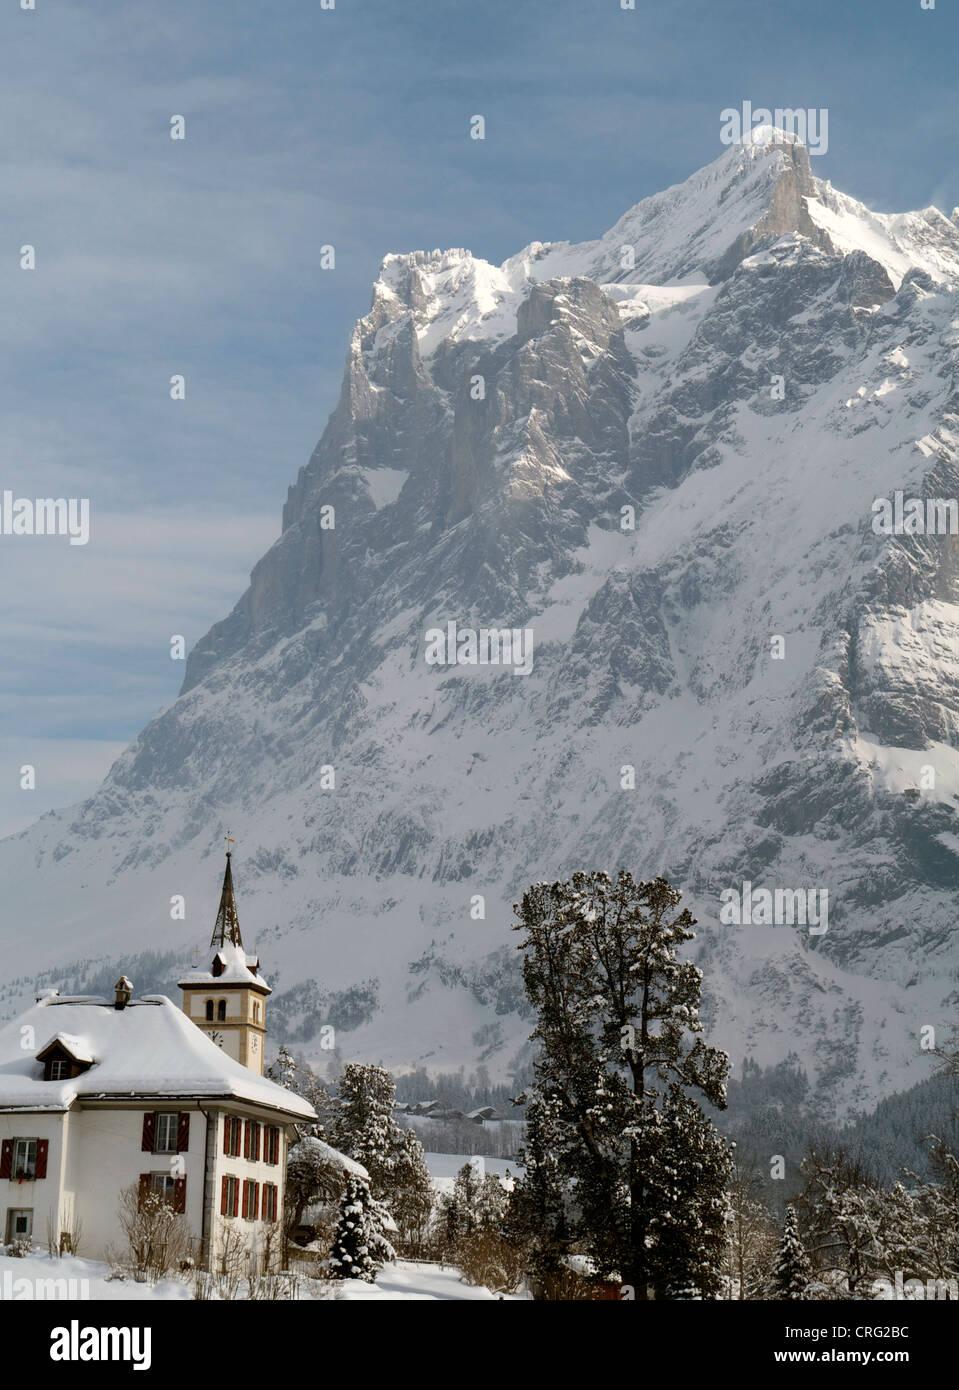 Grindelwald skiing region in Interlaken-Oberhasli Switzerland Eiger mountain Stock Photo